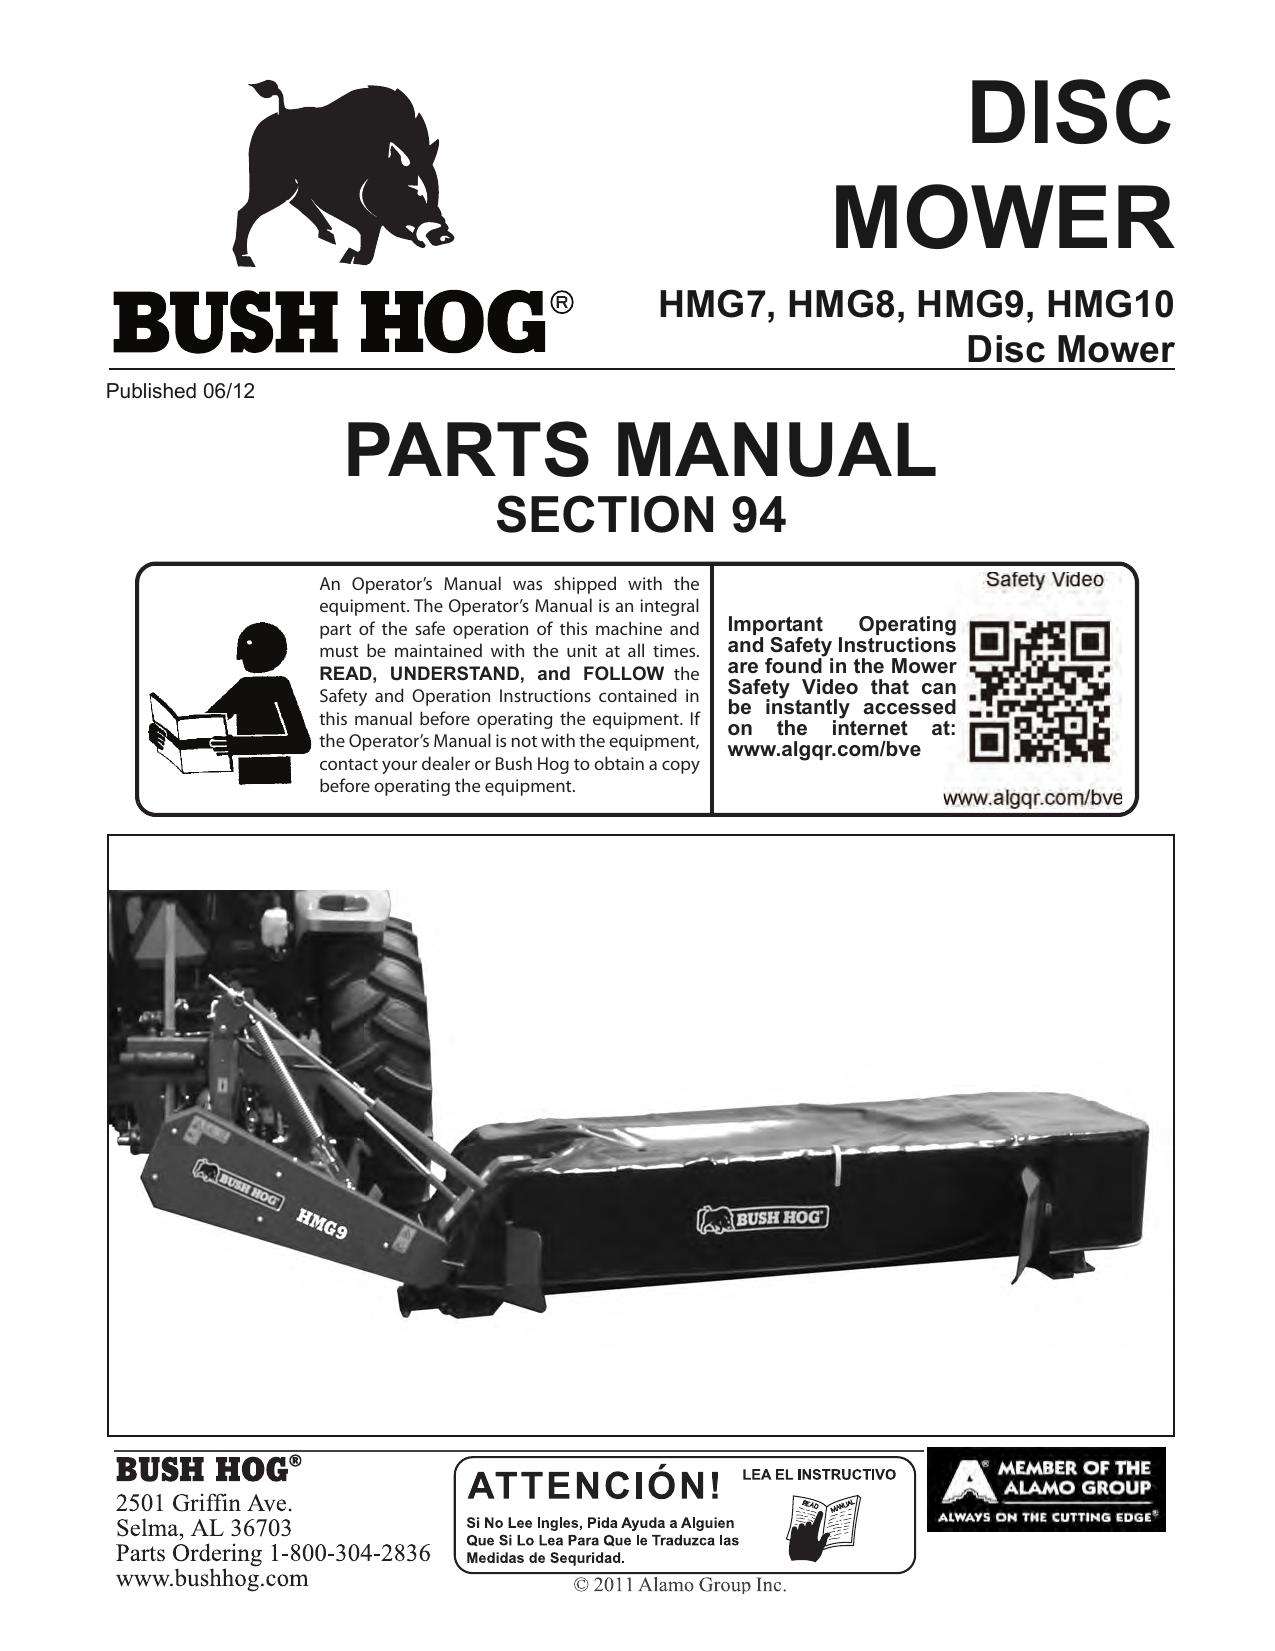 DISC MOWER PARTS MANUAL SECTION 94 | manualzz com